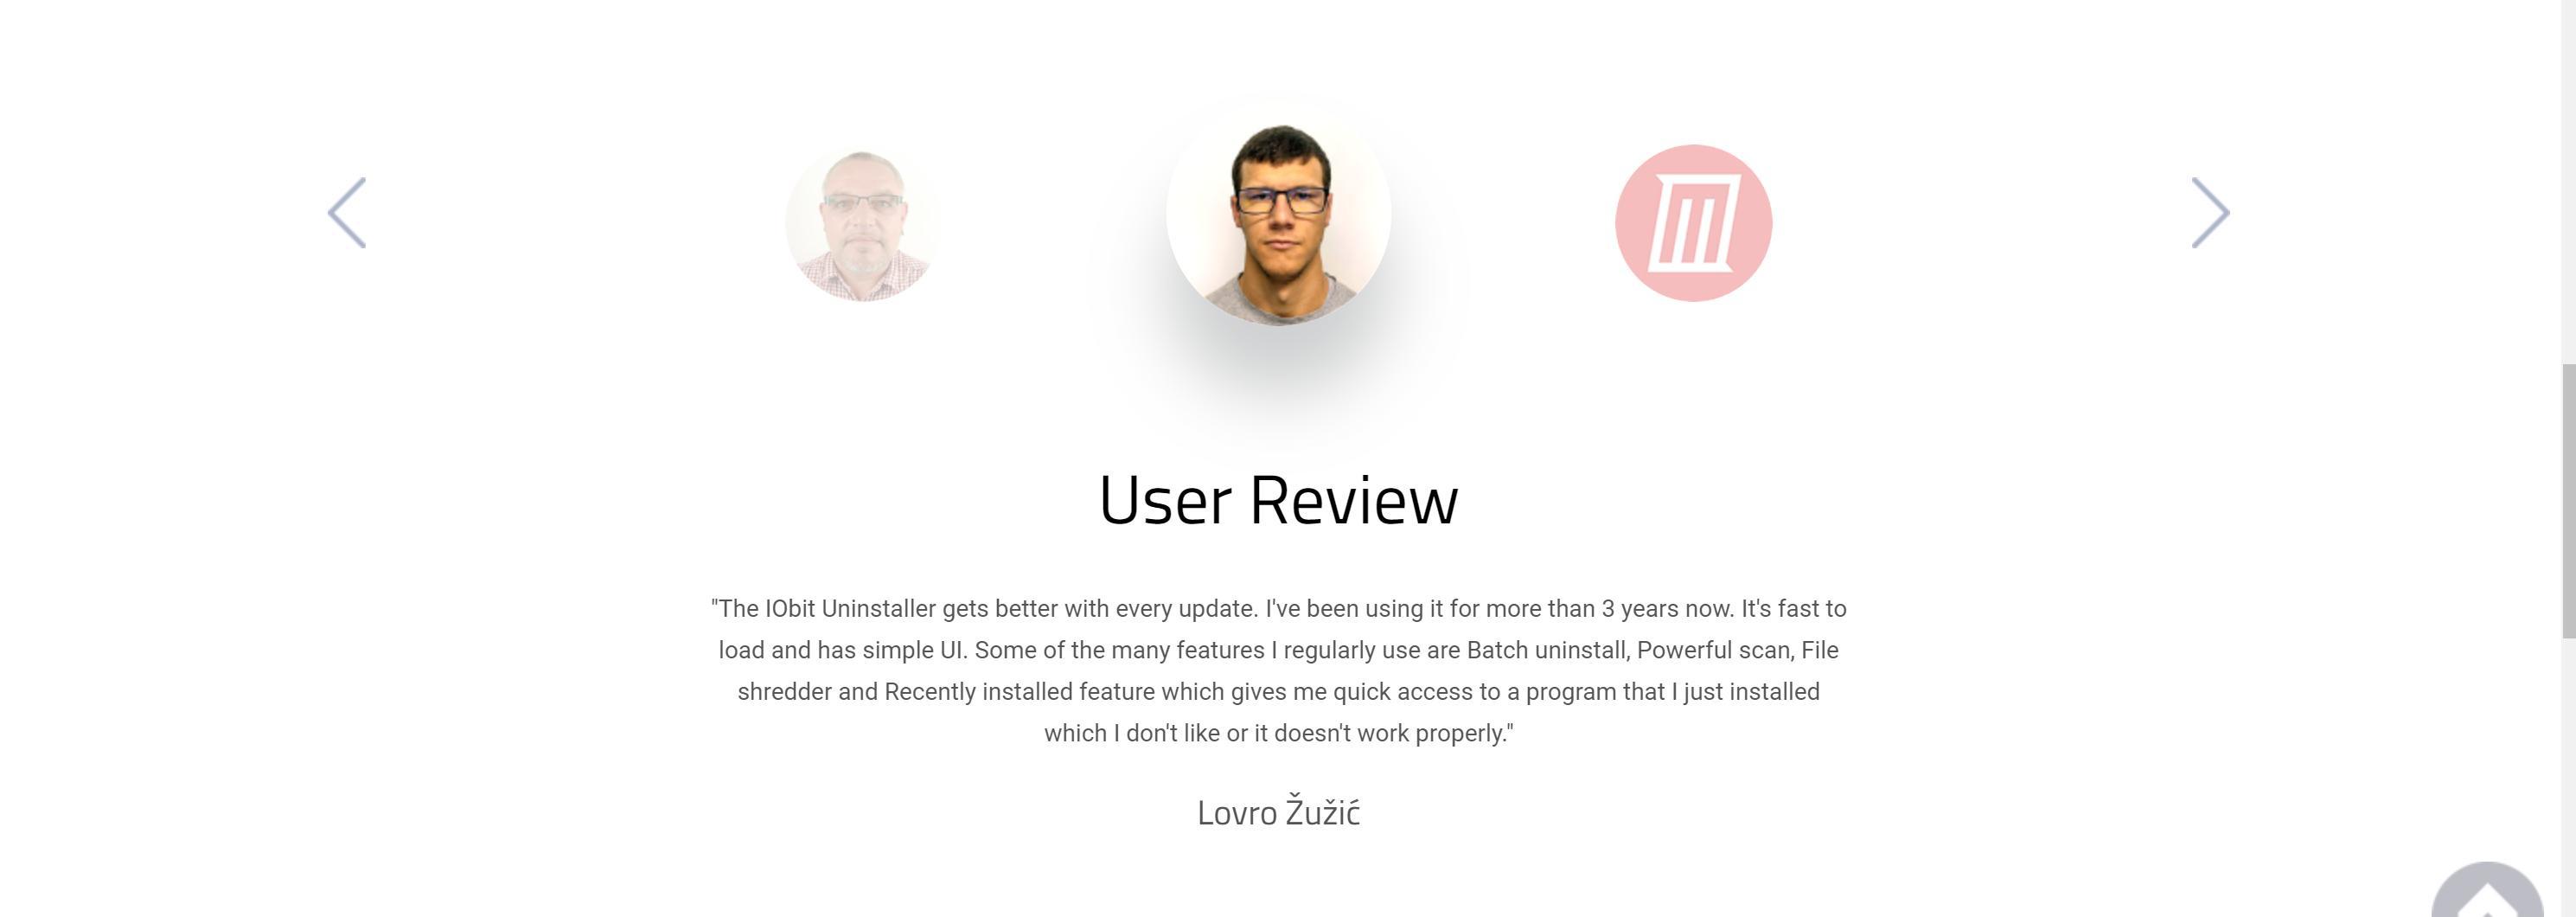 Unistaller pro customer reviews